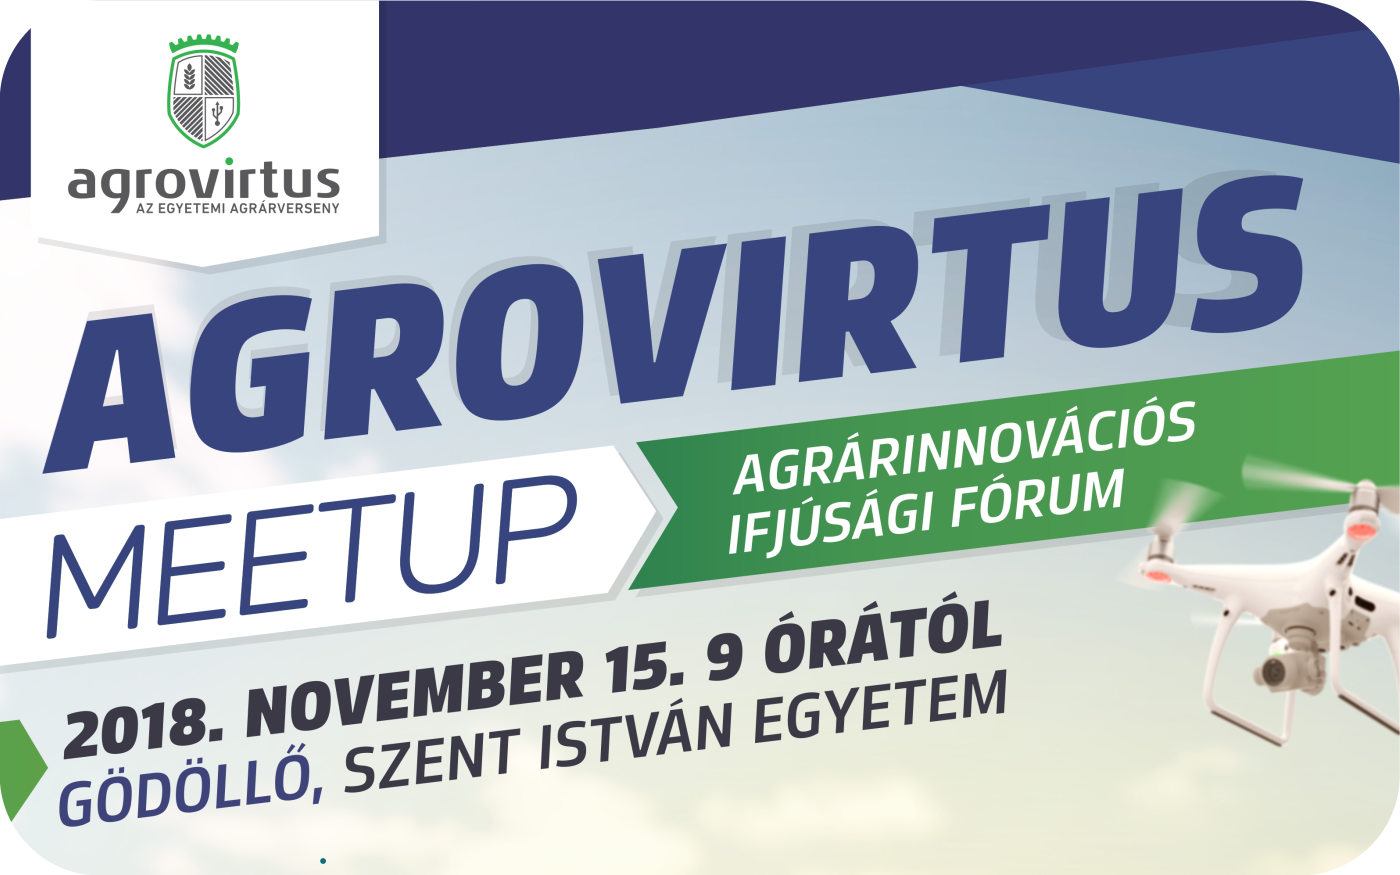 agrovirtus-2-GUT